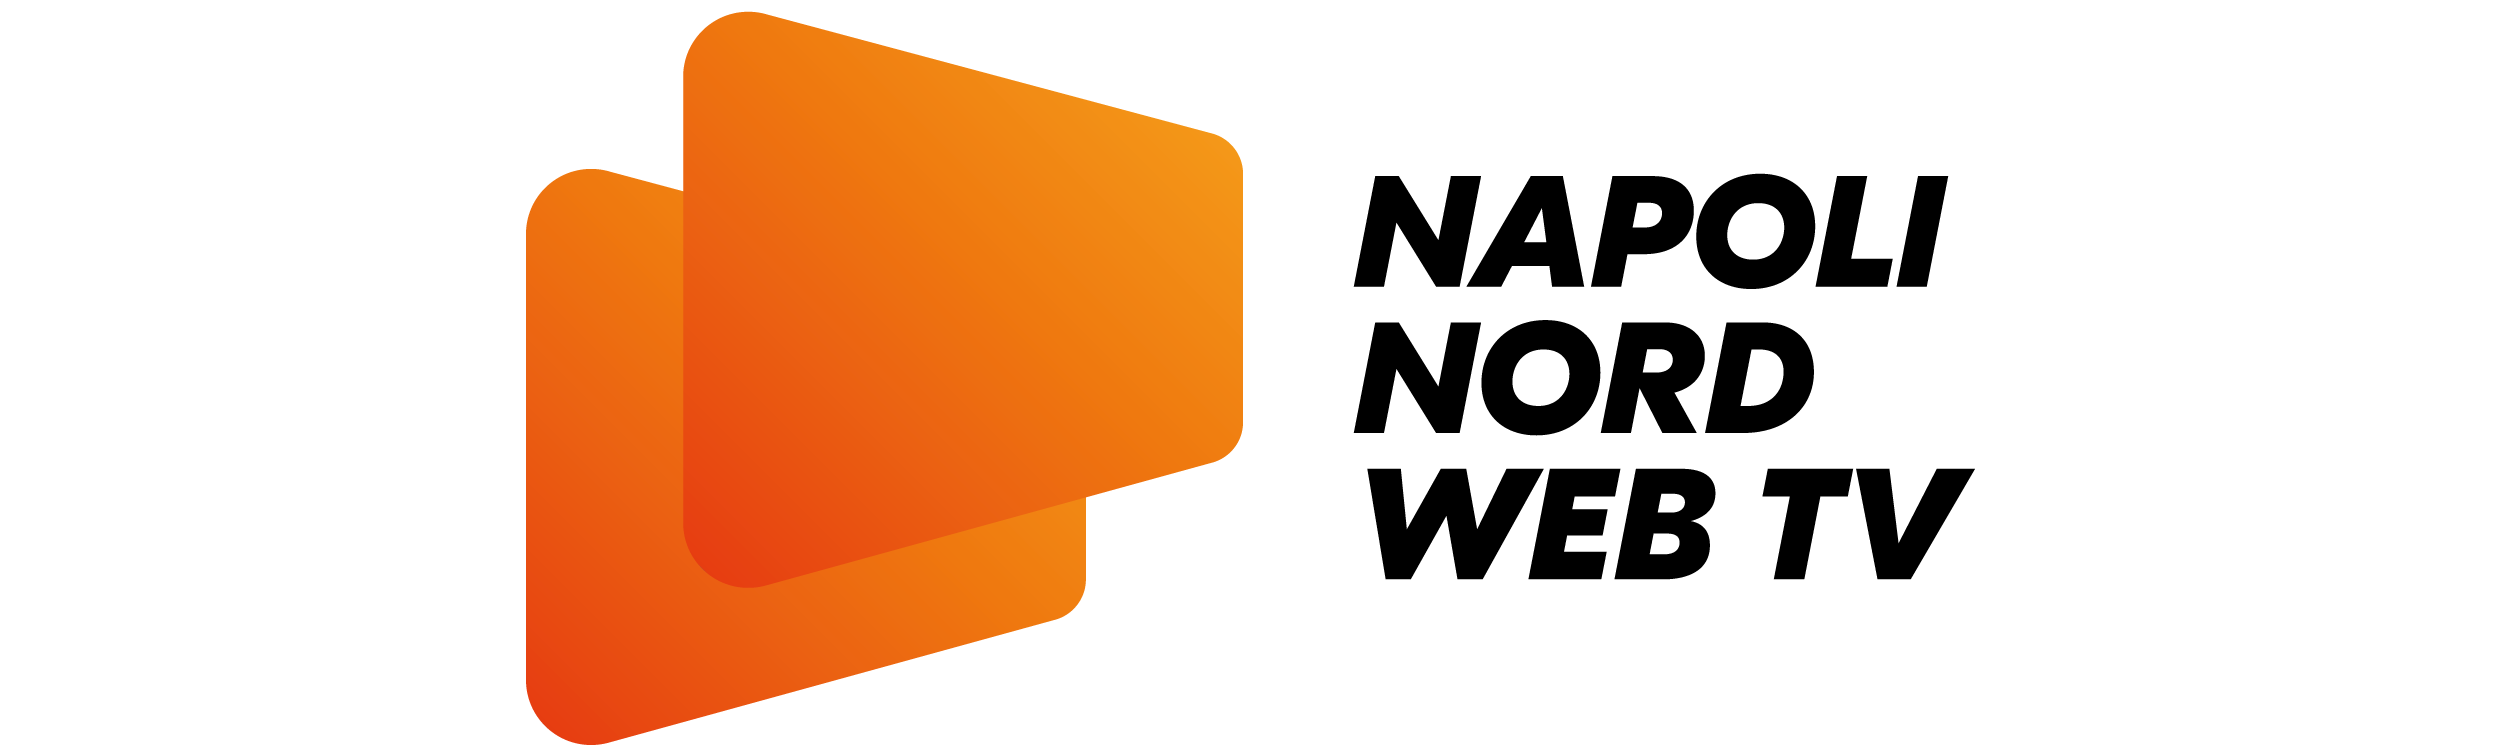 Napoli Nord Web Tv